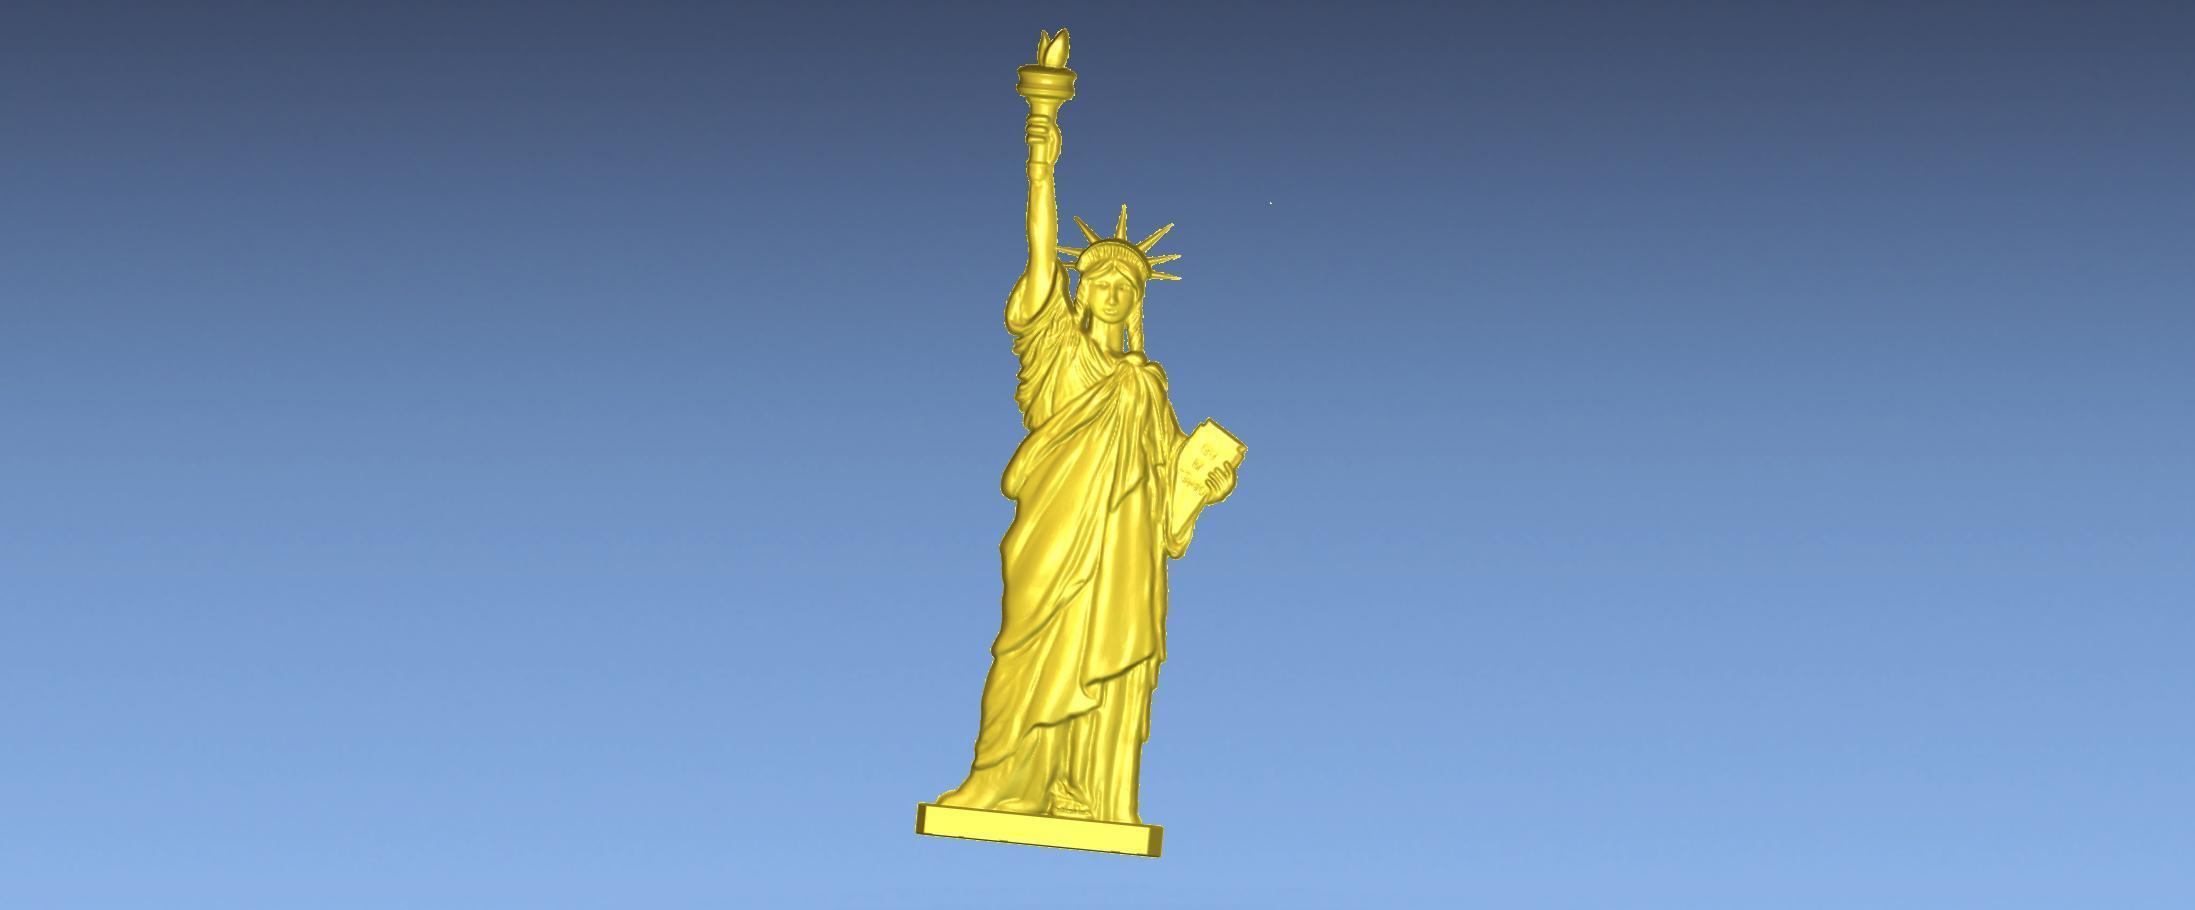 6.jpg Download free STL file LIBRETY STATUE 3D STL FILE • 3D printing design, ALPHA_MENA